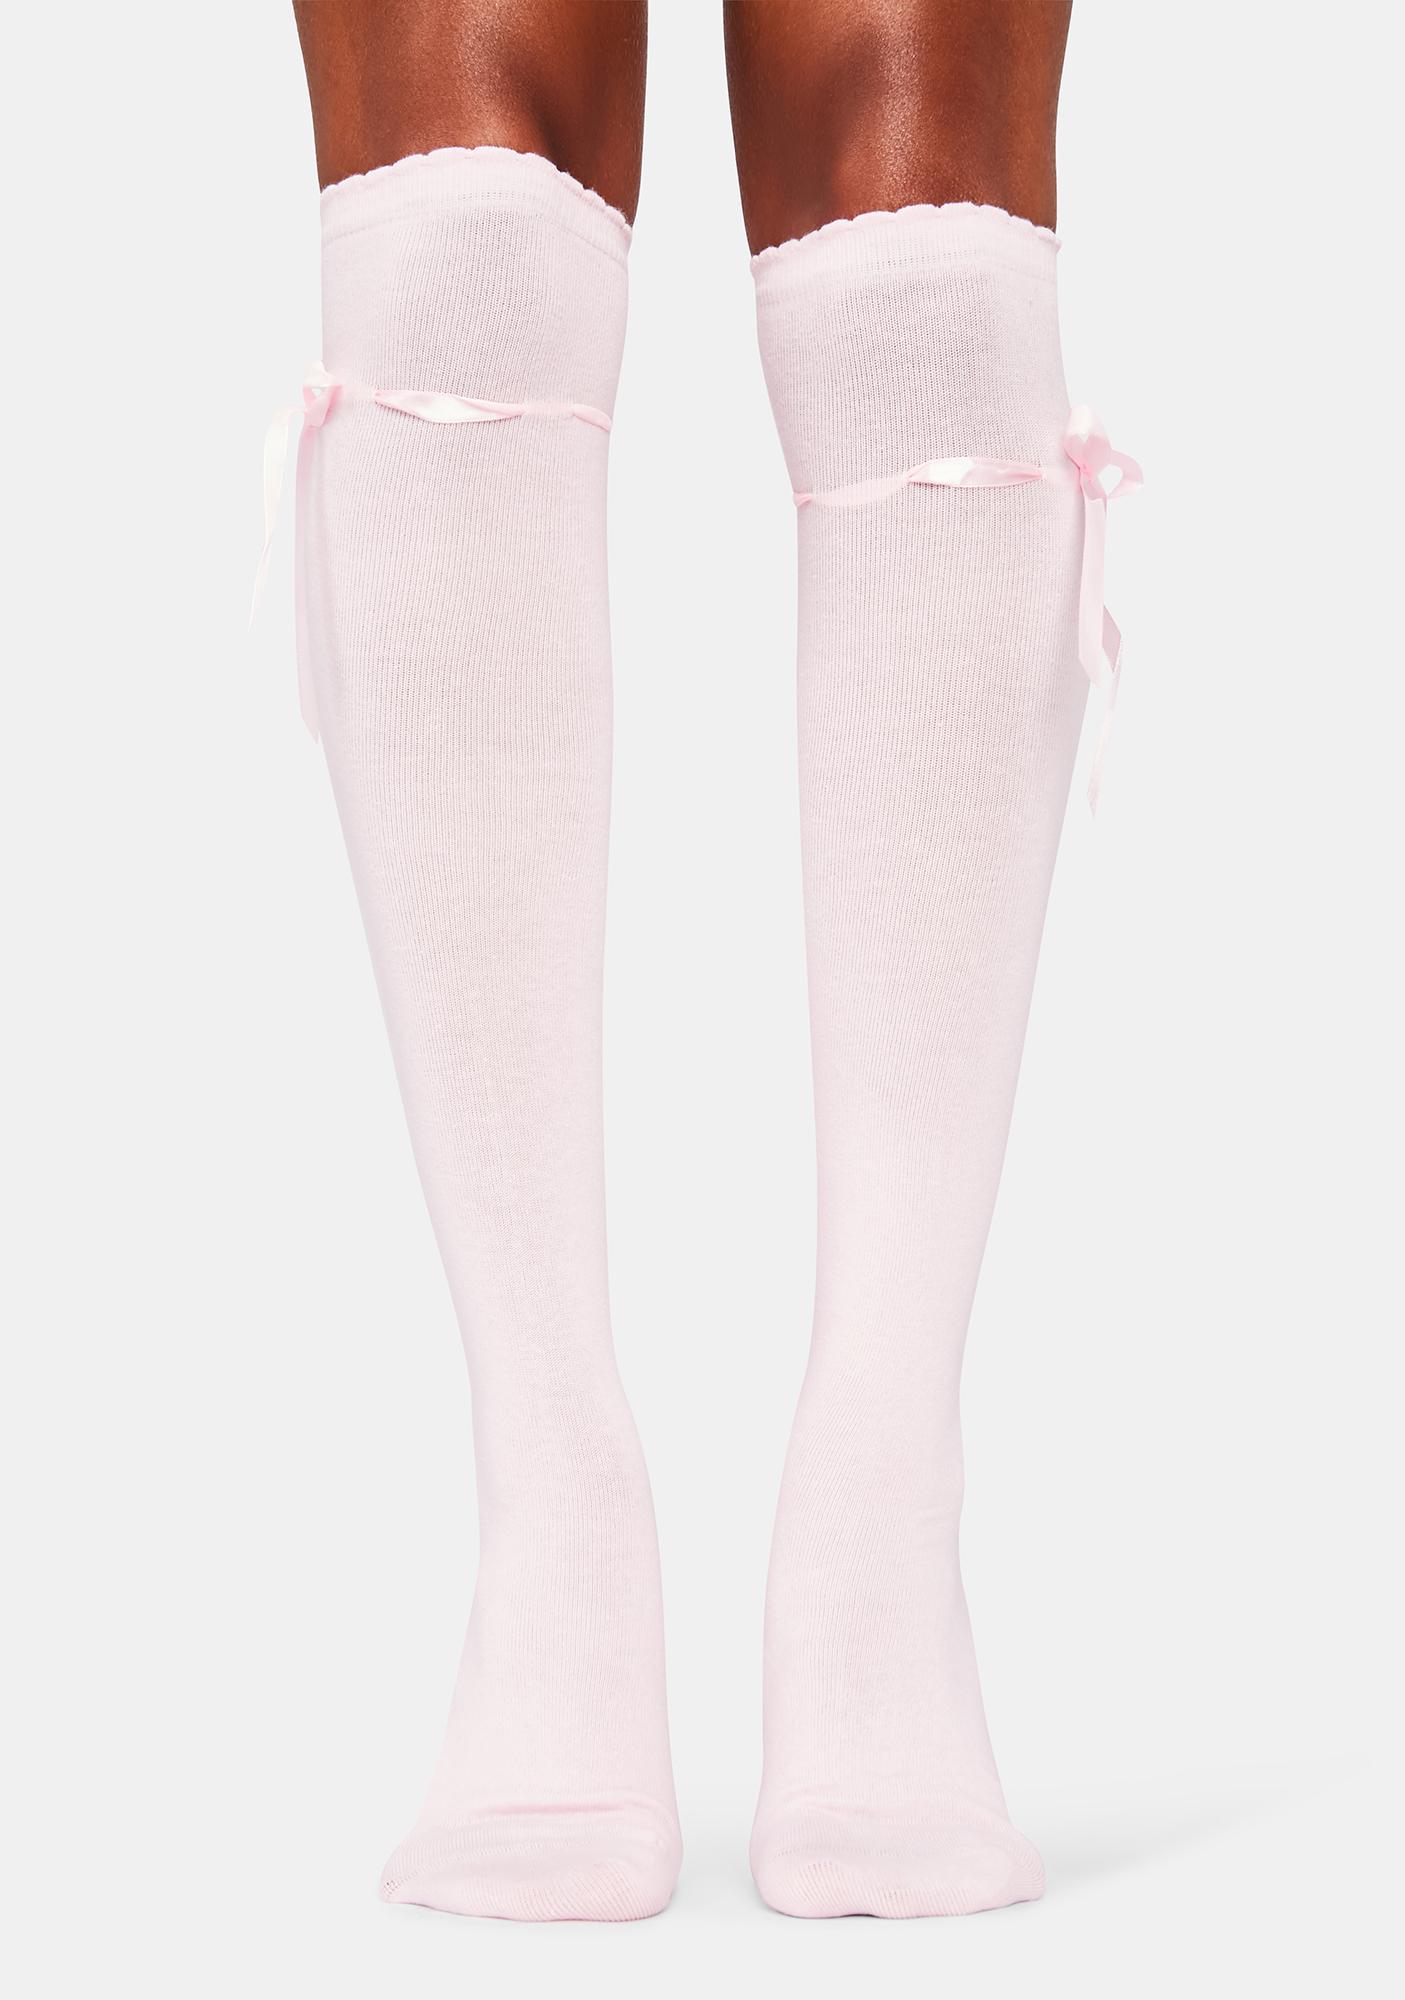 Blush Quiet Dreams Knee High Socks